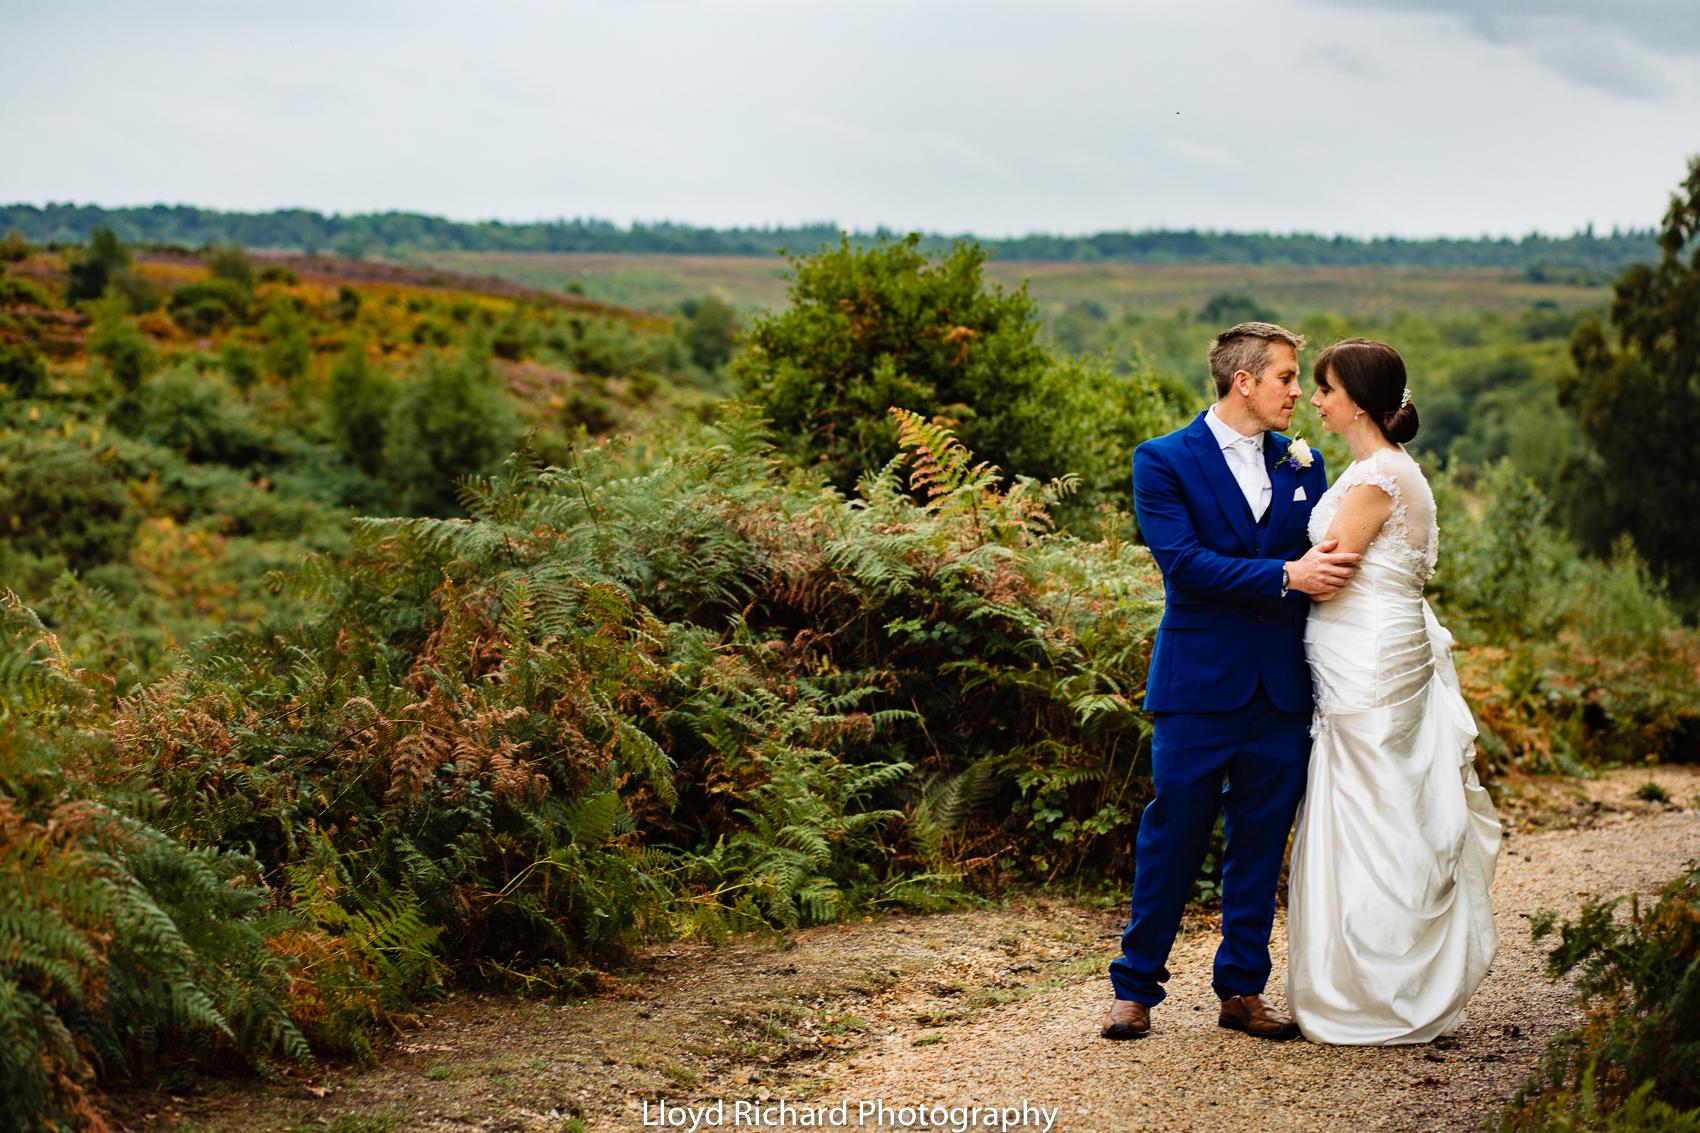 wedding photos taken at Moorhill House Hotel wedding new forest wedding